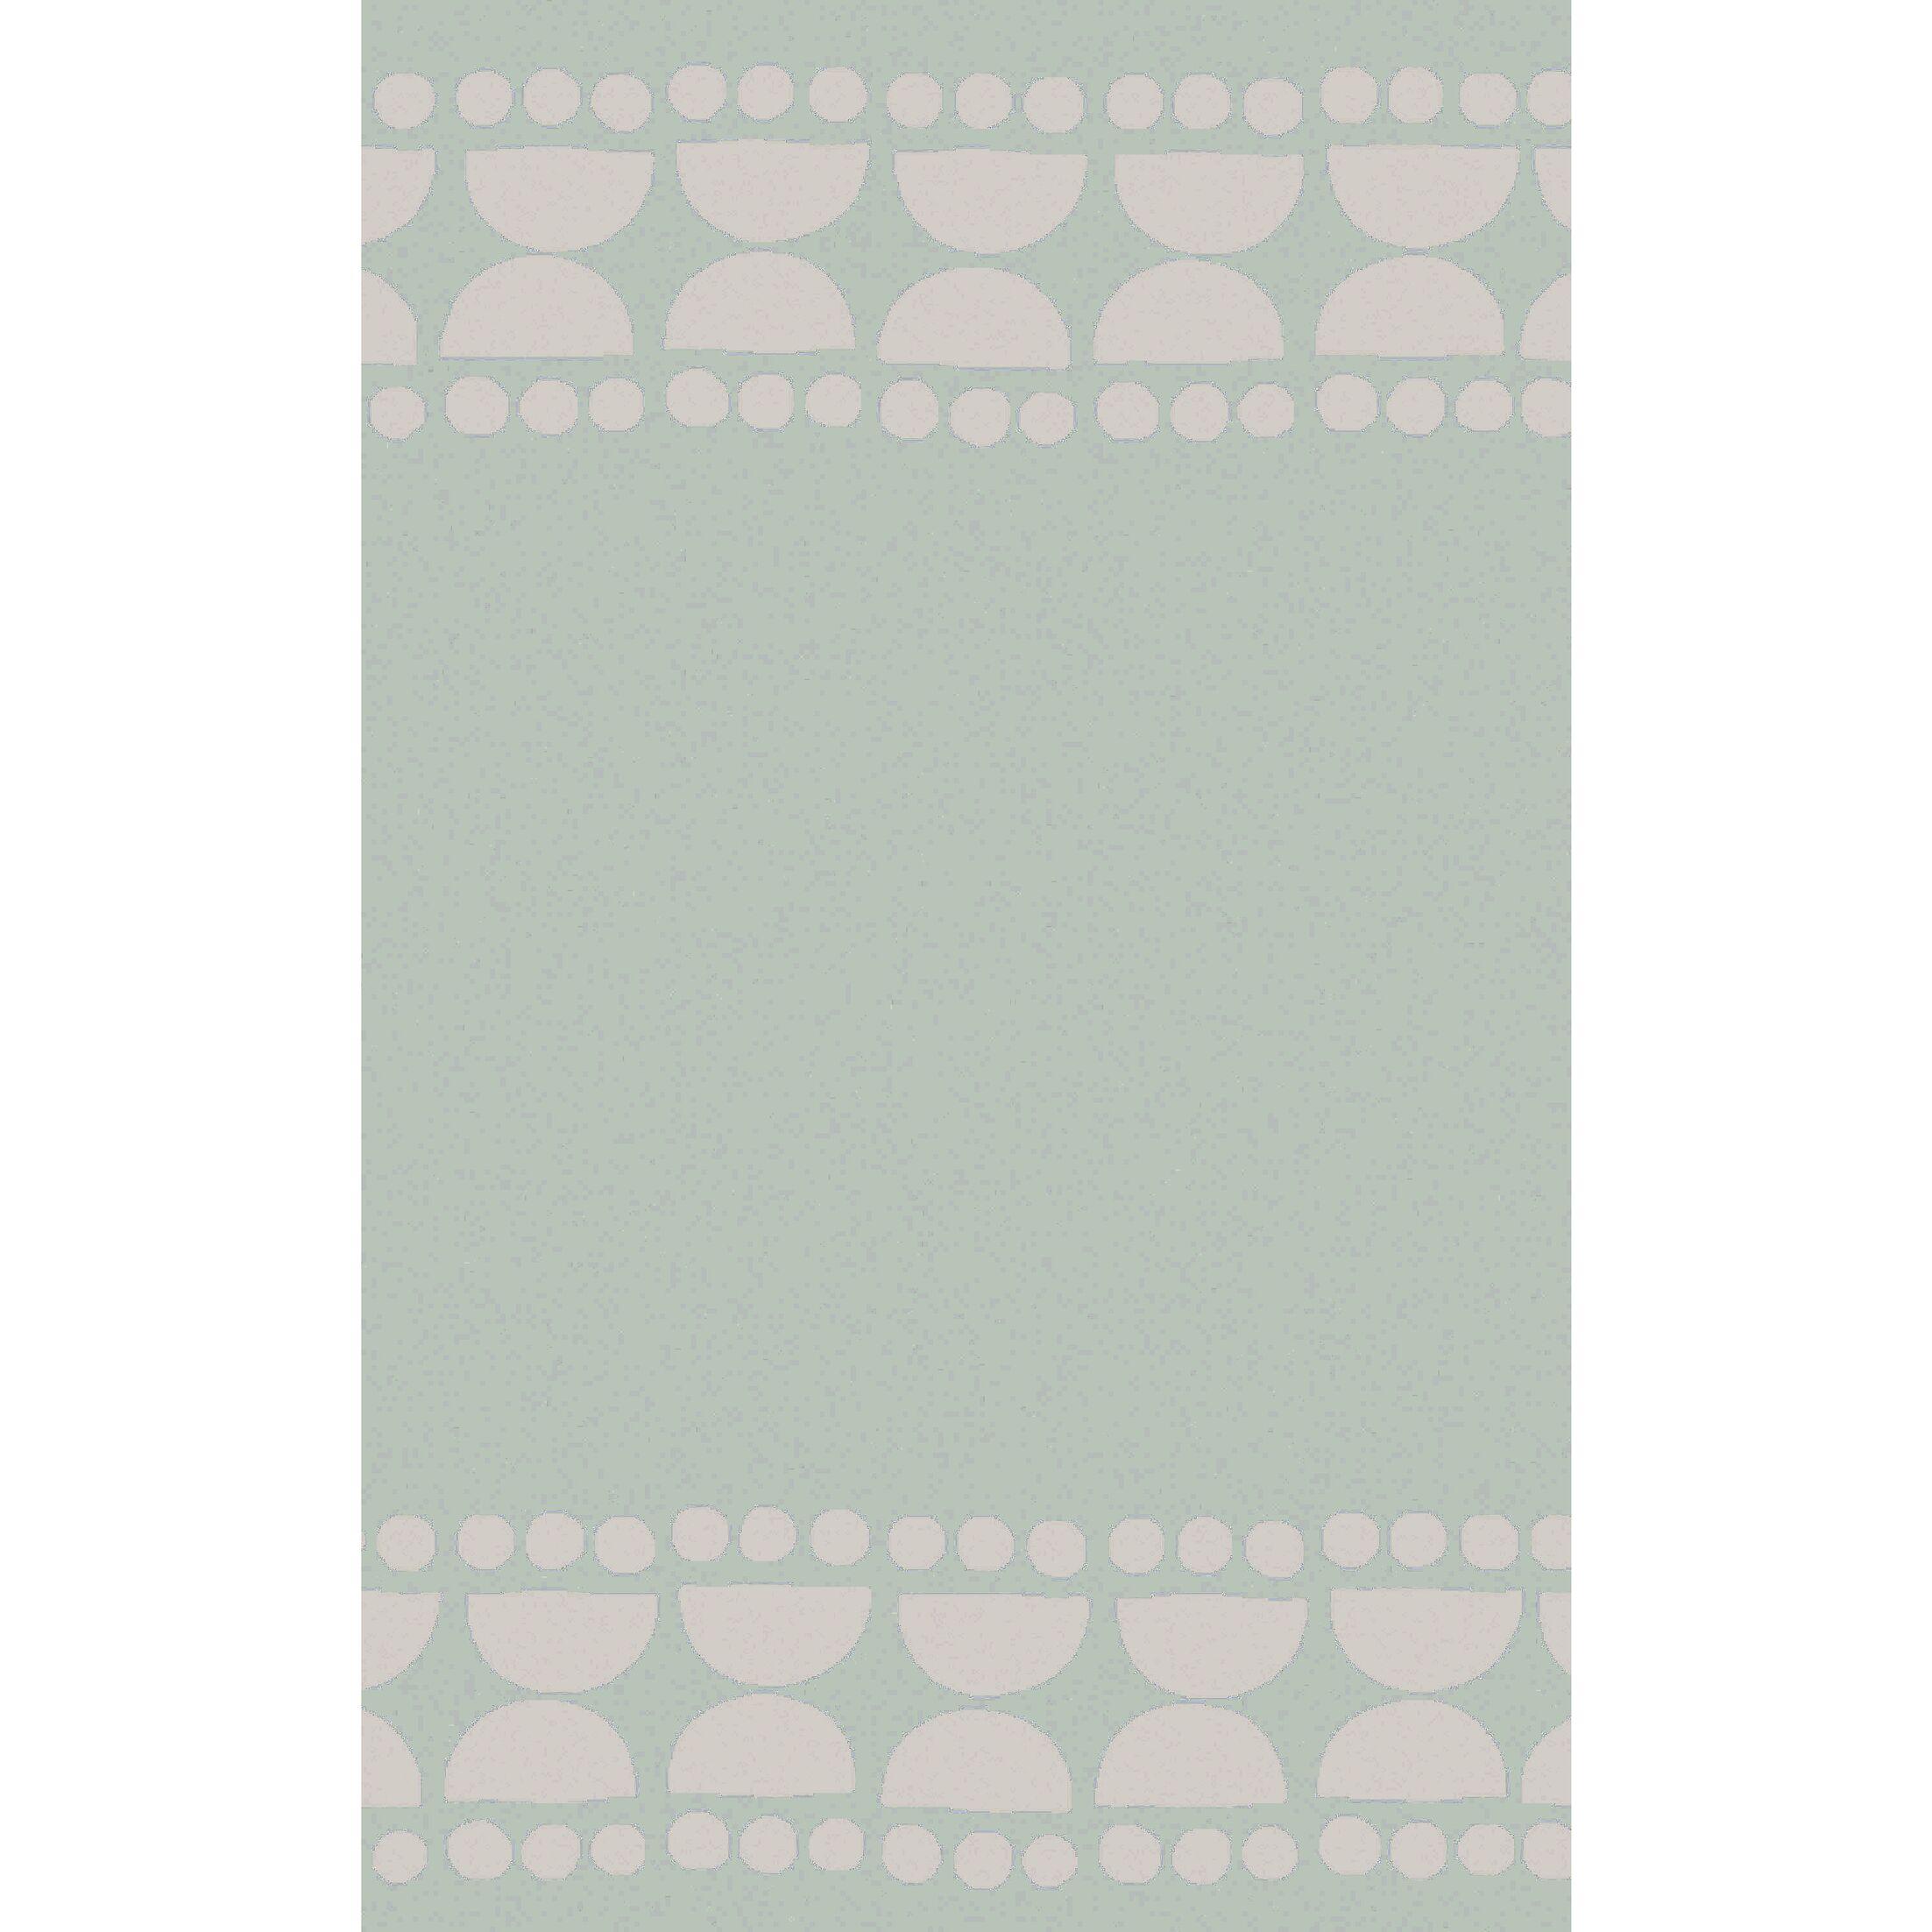 Gabb Hand-Woven Sea Foam/Light Gray Area Rug Rug Size: Rectangle 8' x 11'